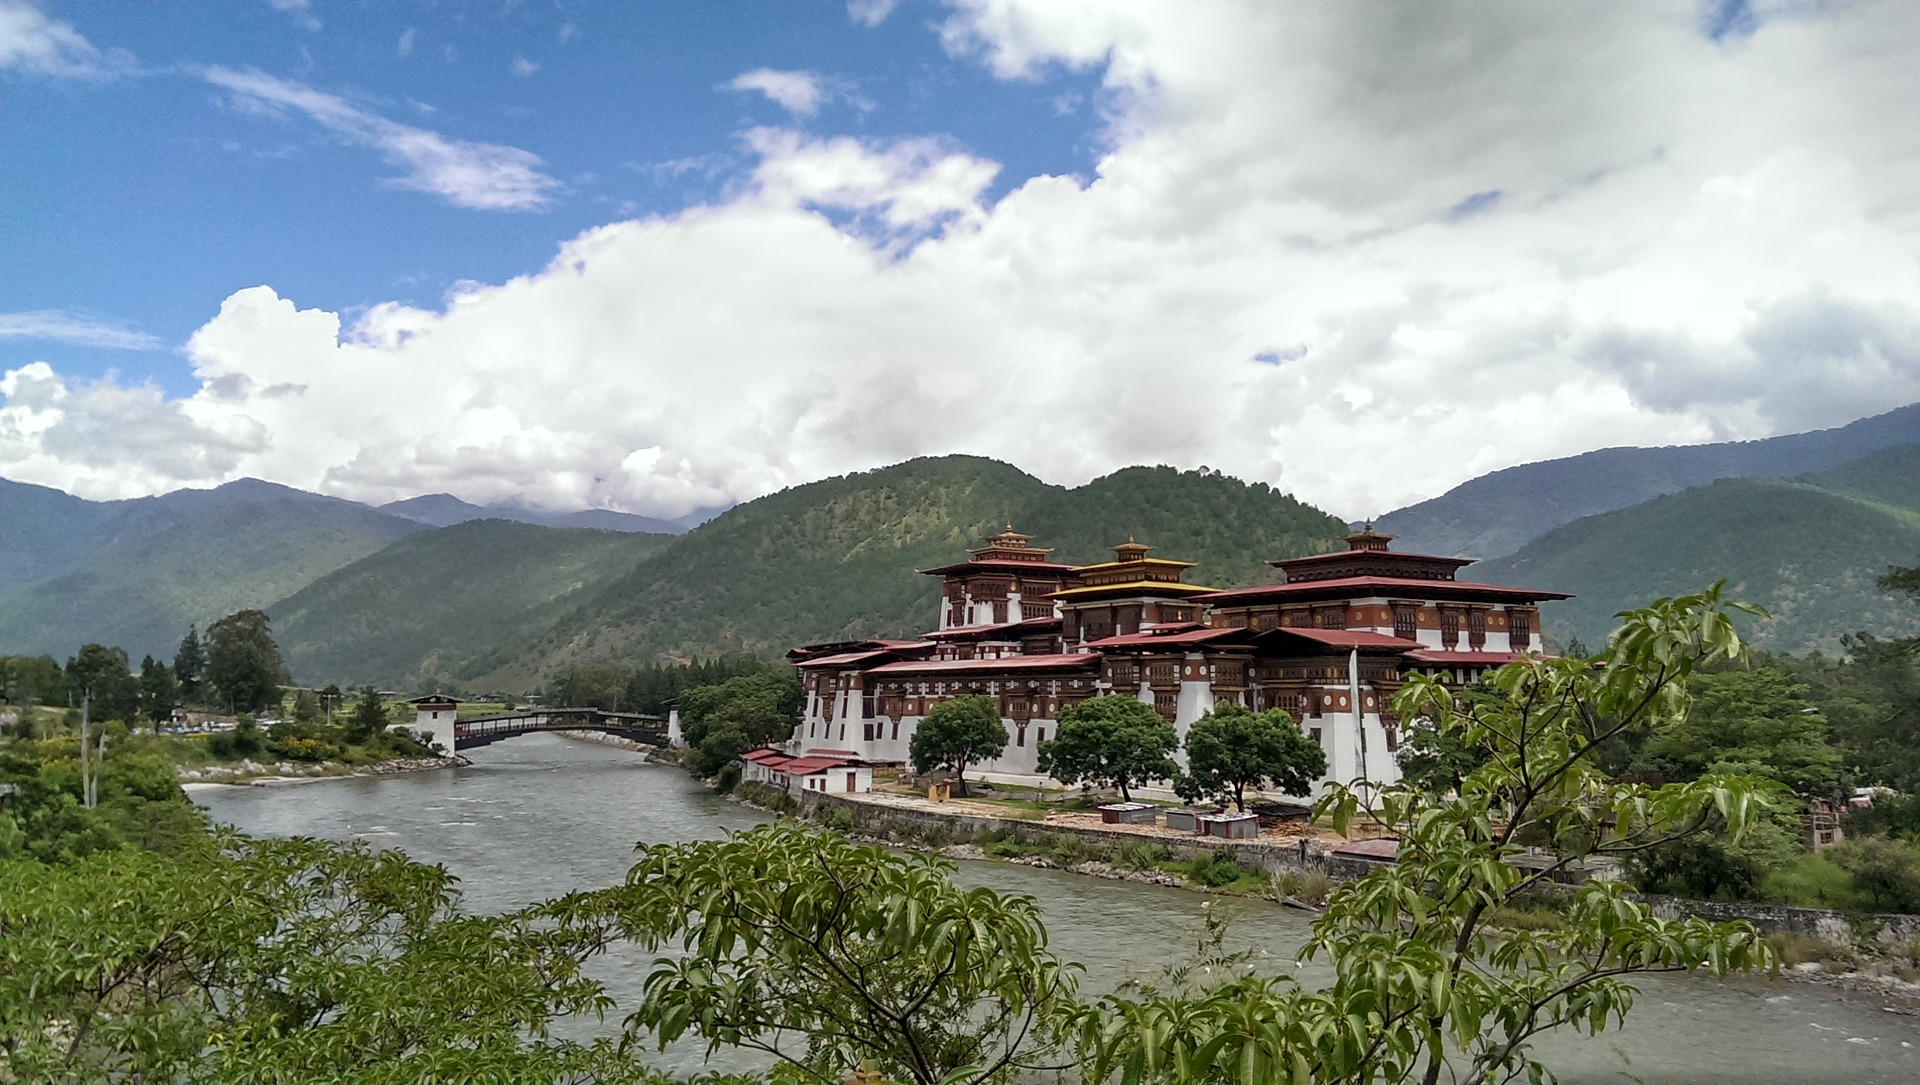 Bhutan Dragon Kingdom - Punakha Dzong, Bhutan